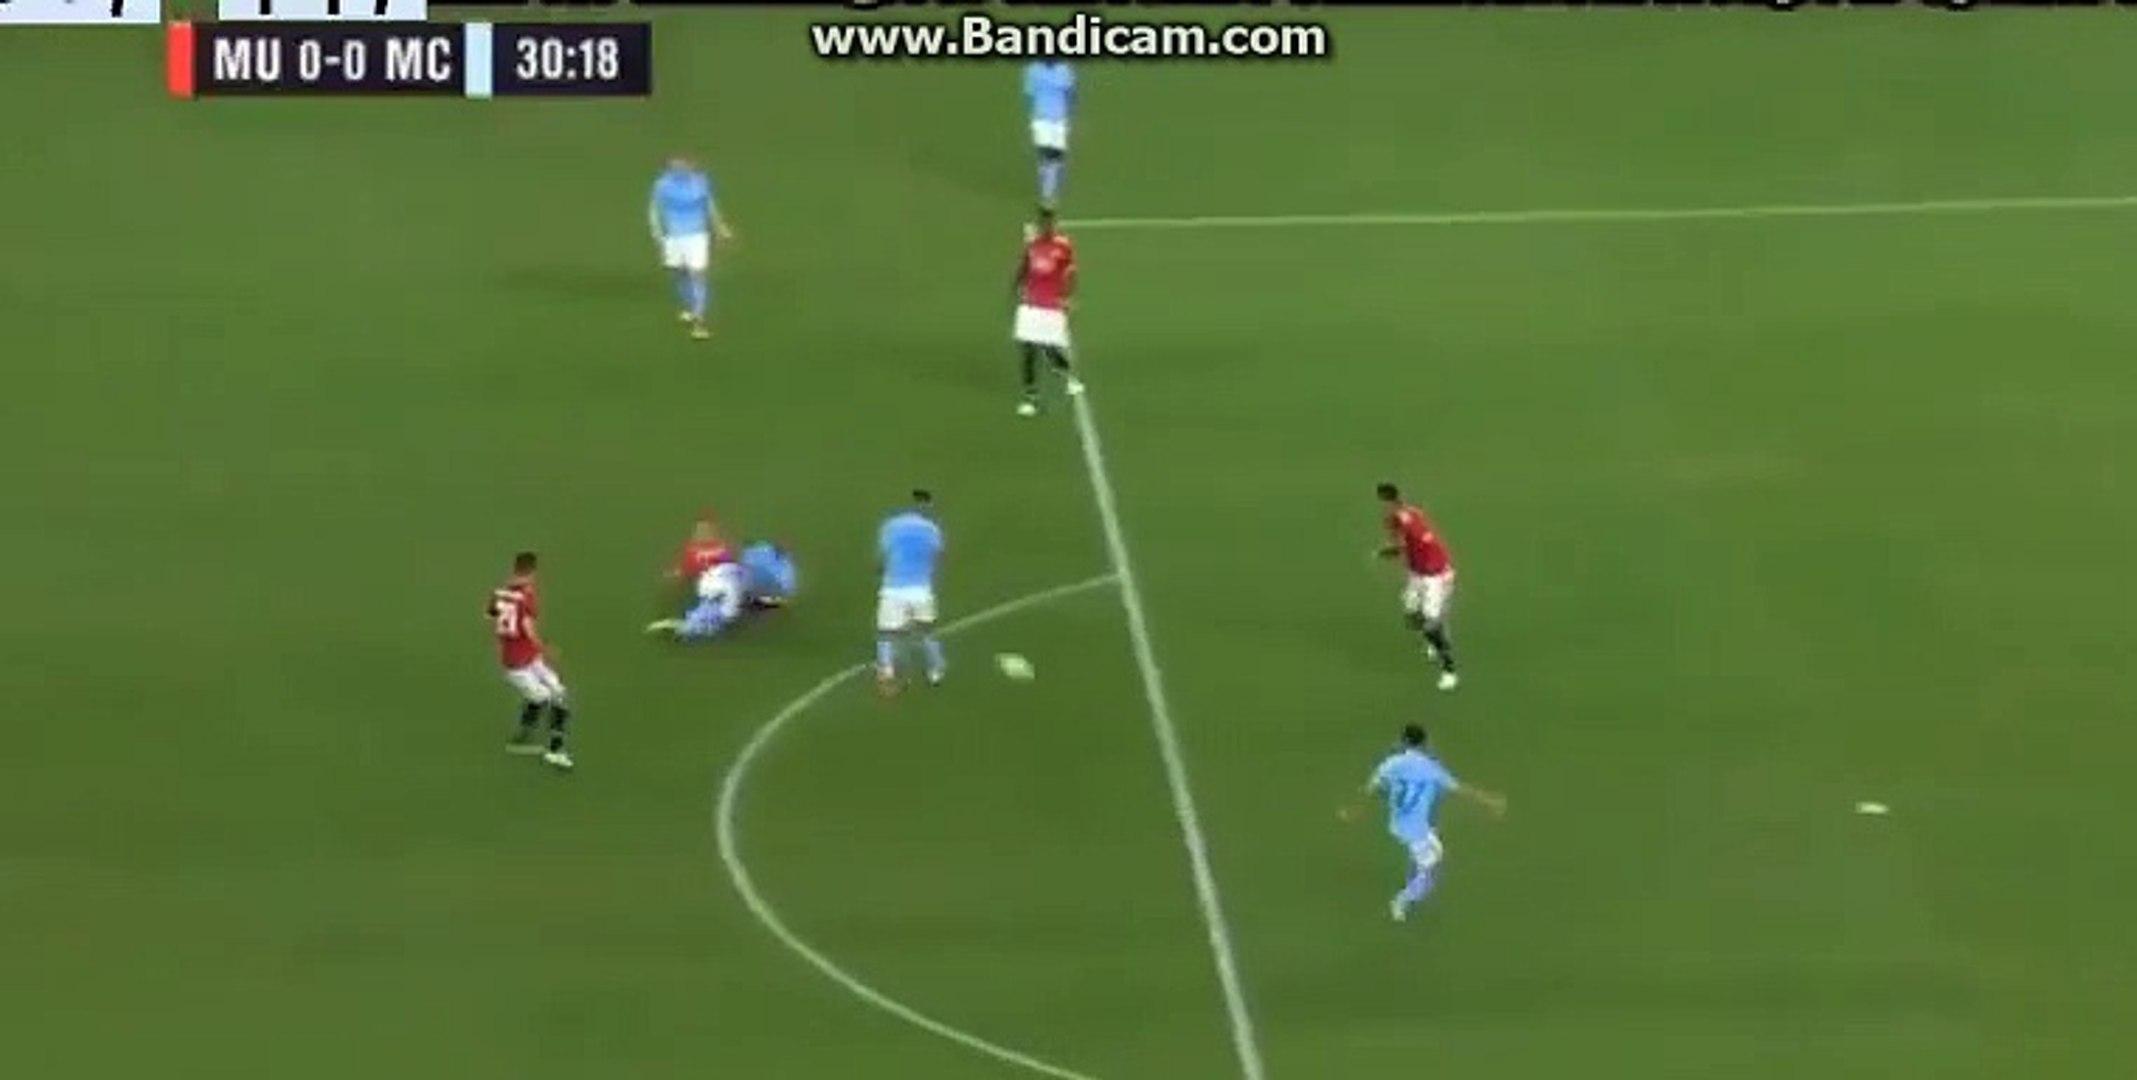 Aguero Amazing Chance -Manchester United Vs Manchester City  0-0  21/07/2017  HD